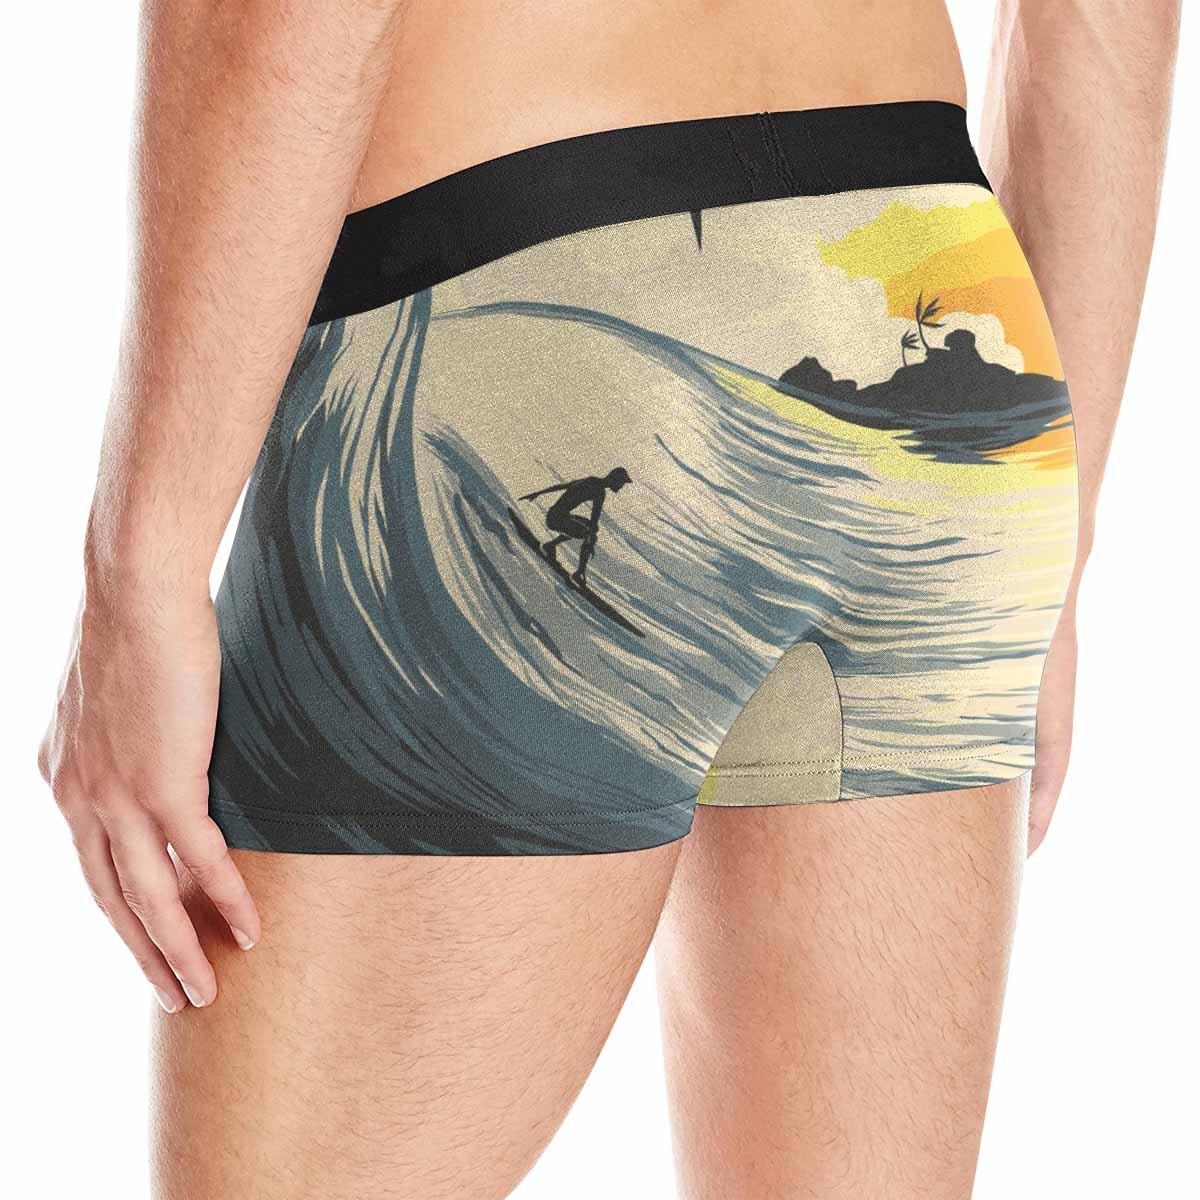 INTERESTPRINT Boxer Briefs Mens Underwear Tropical Island Wave and Surfer at Sunset XS-3XL